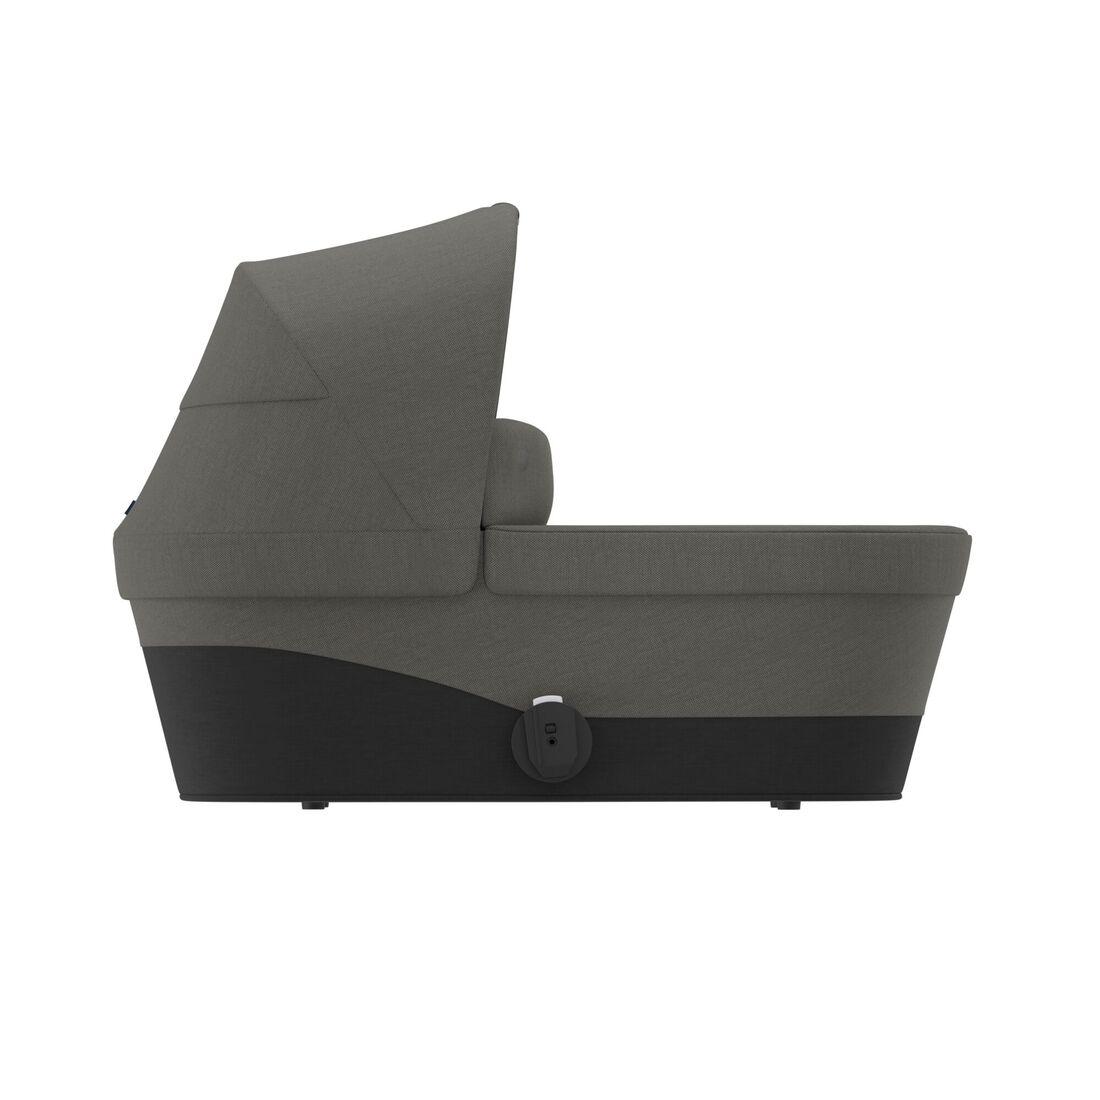 CYBEX Gazelle S Cot - Soho Grey in Soho Grey large Bild 3